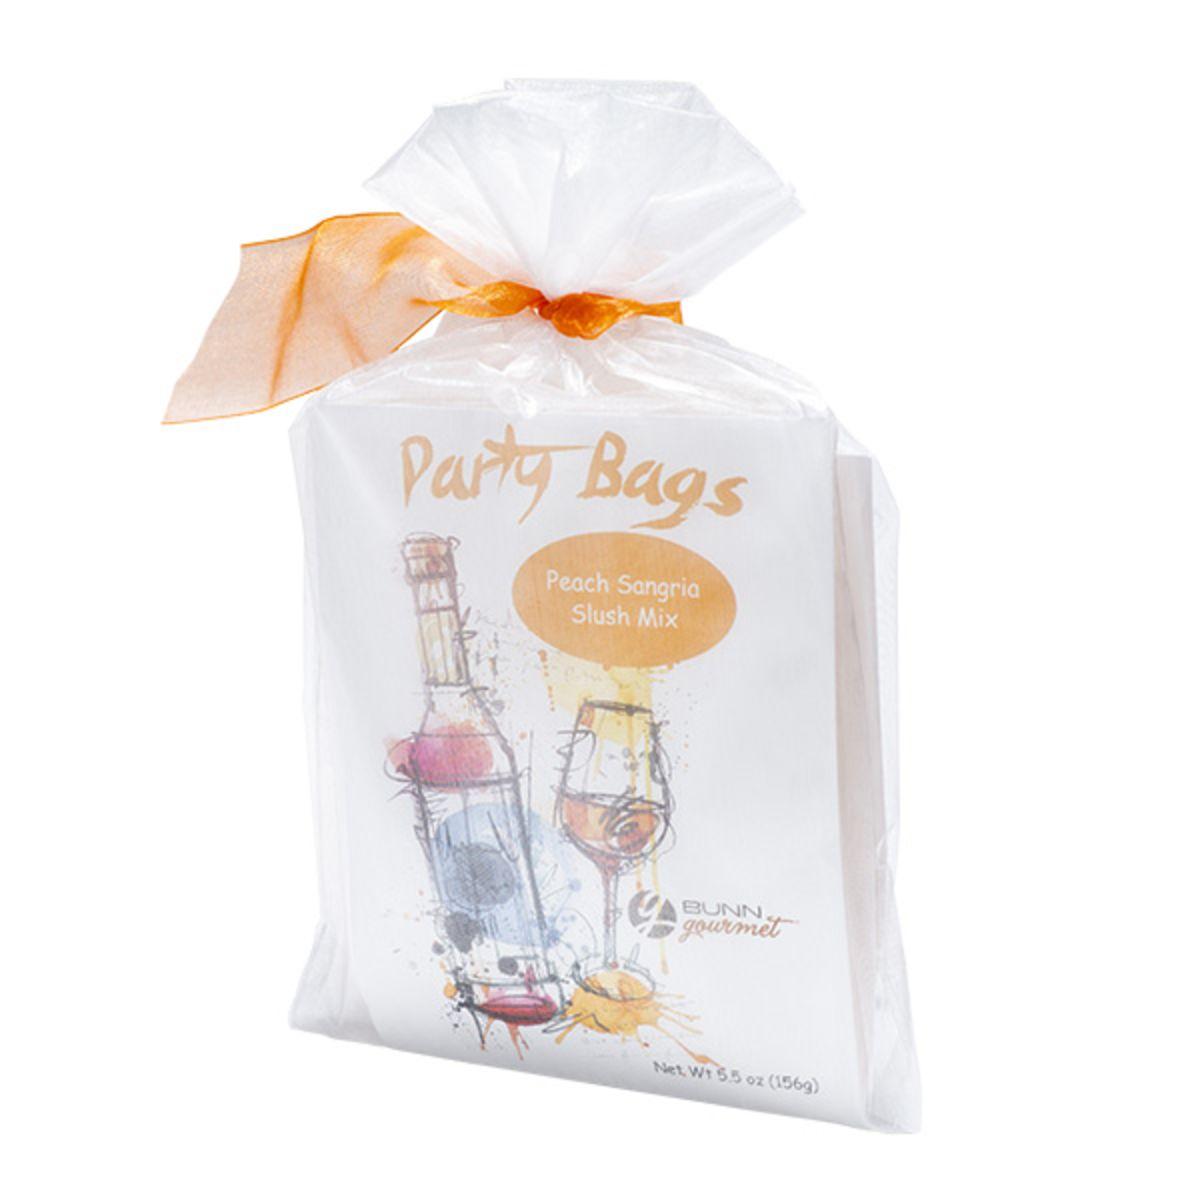 Peach Sangria Slush Mix